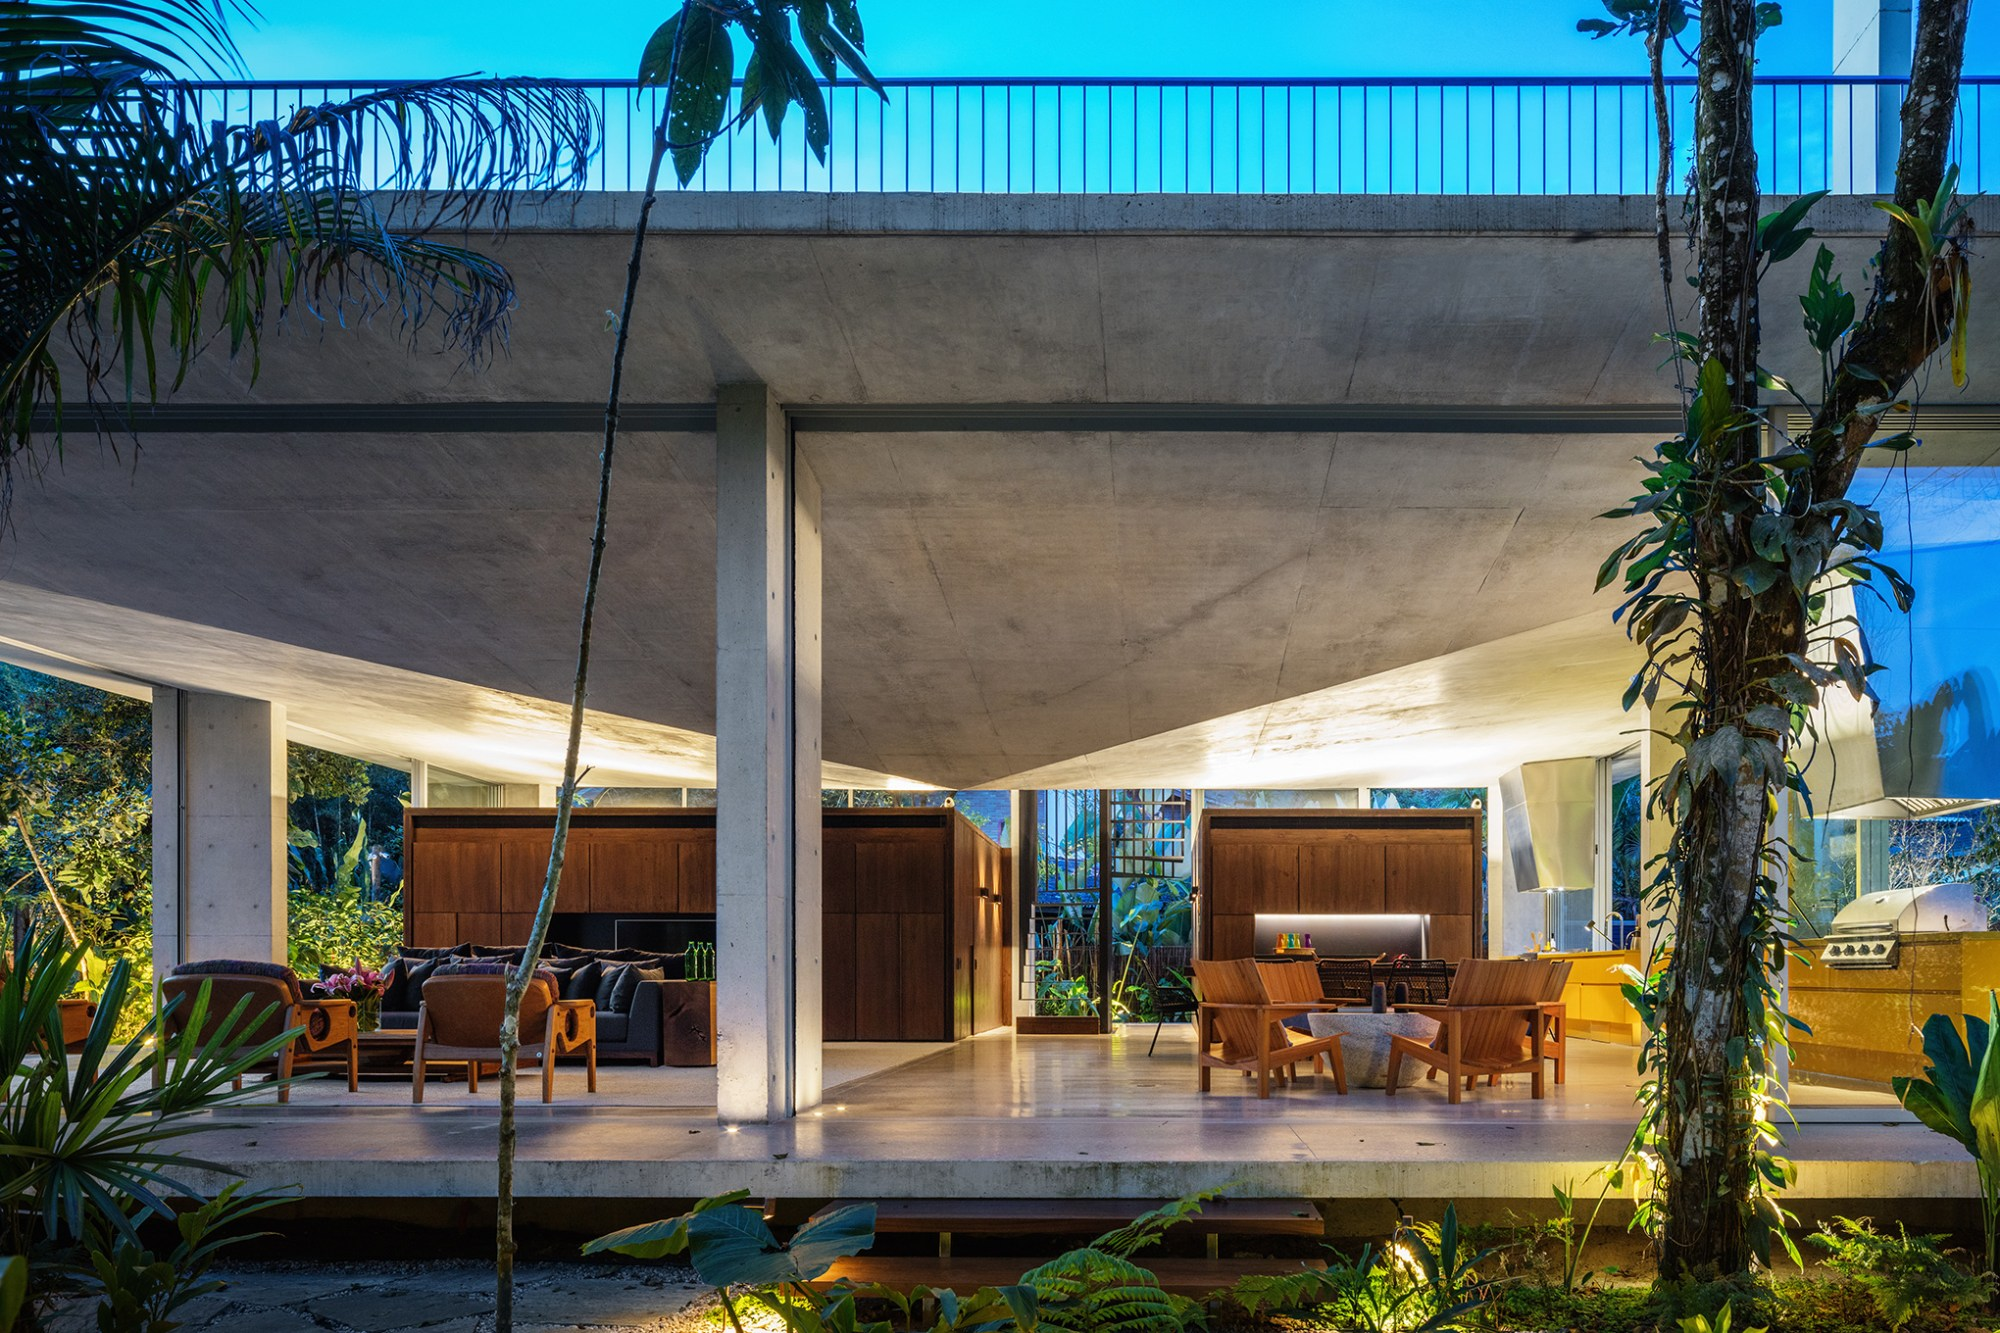 Residencia Itamambuca In Brazil By Gui Mattos Architects